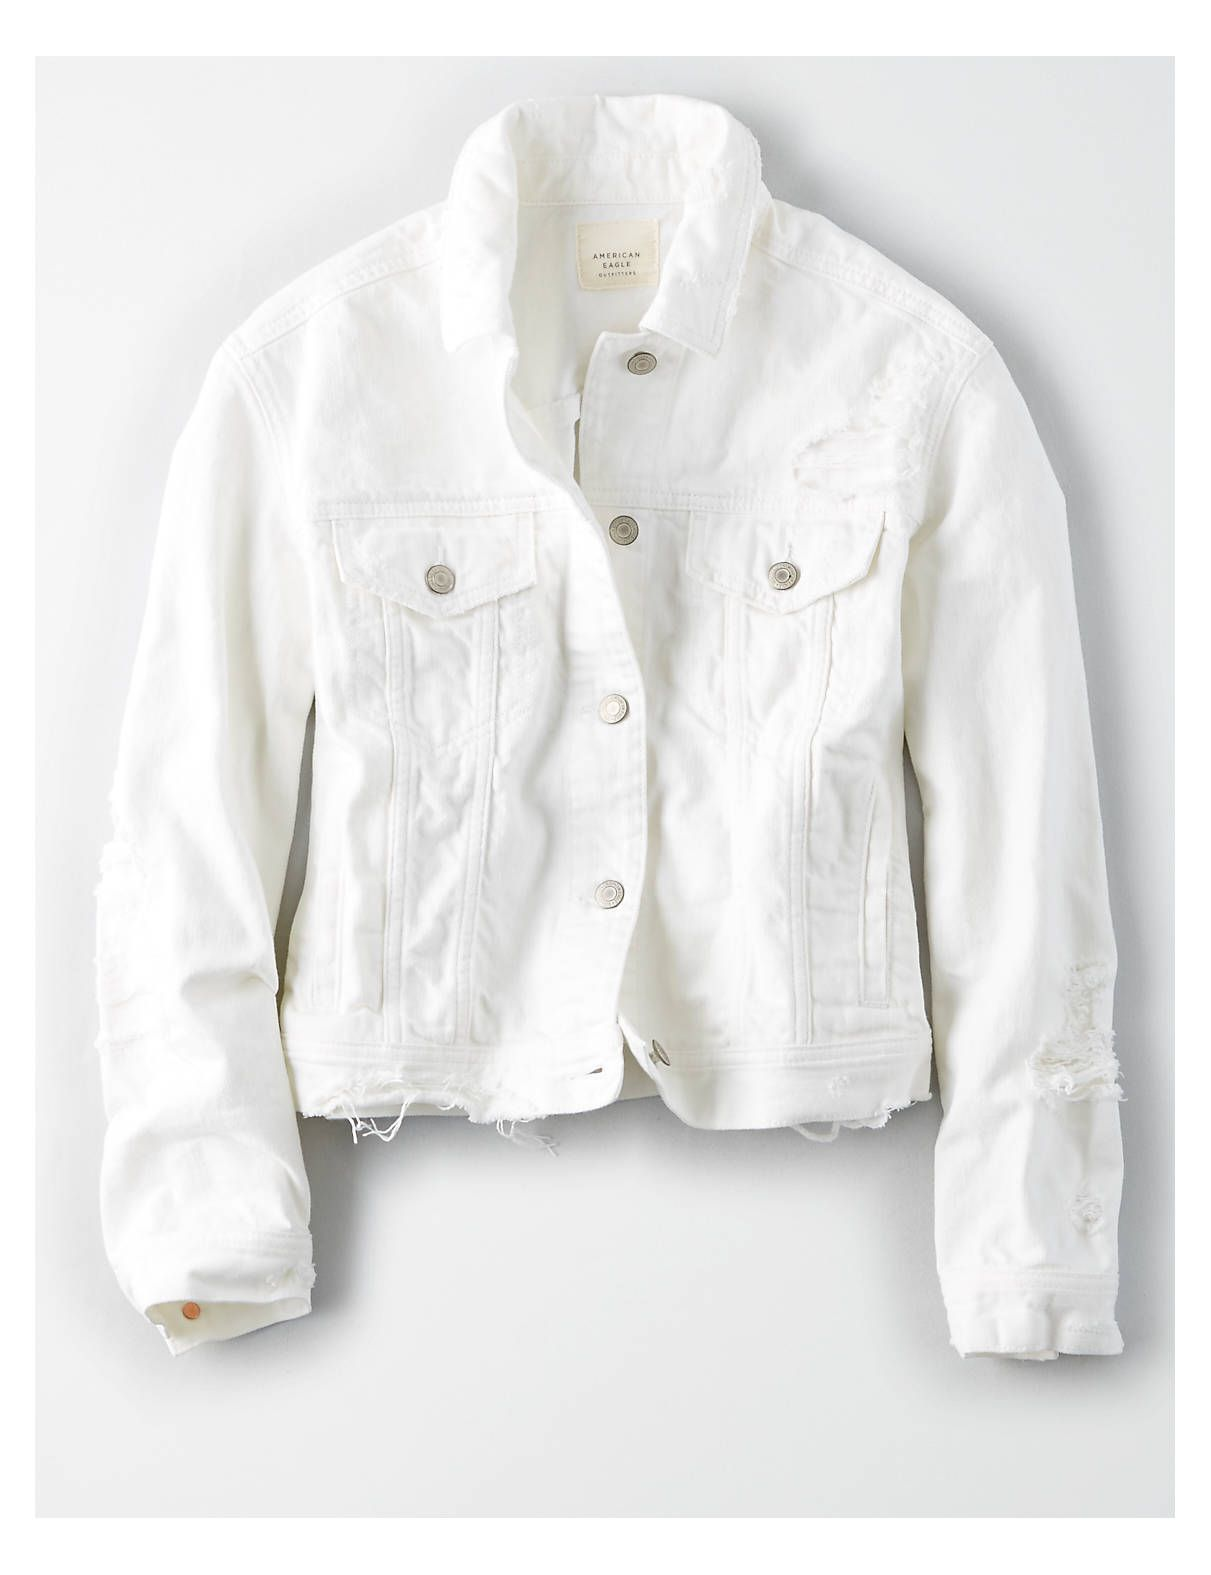 Ae White Denim Jacket White American Eagle Outfitters White Denim Jacket Outfit White Denim Jacket White Jacket Outfit [ 1575 x 1211 Pixel ]